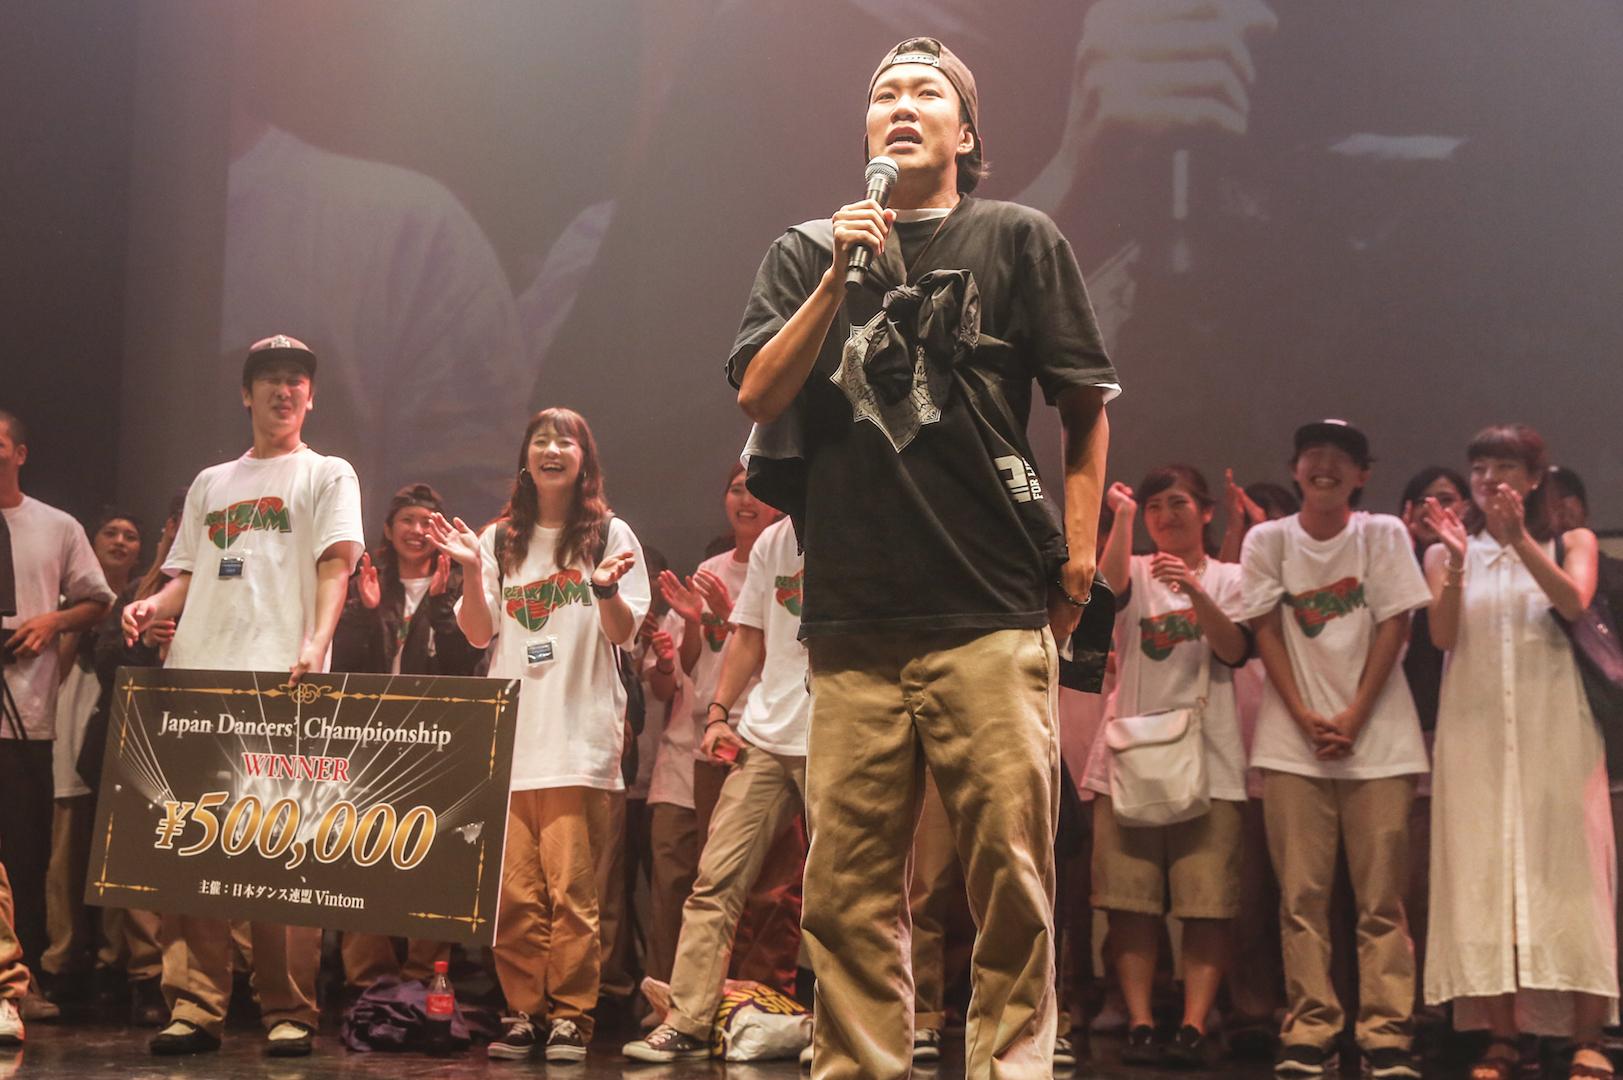 「Japan Dancers' Championship」より 写真提供:Vintom